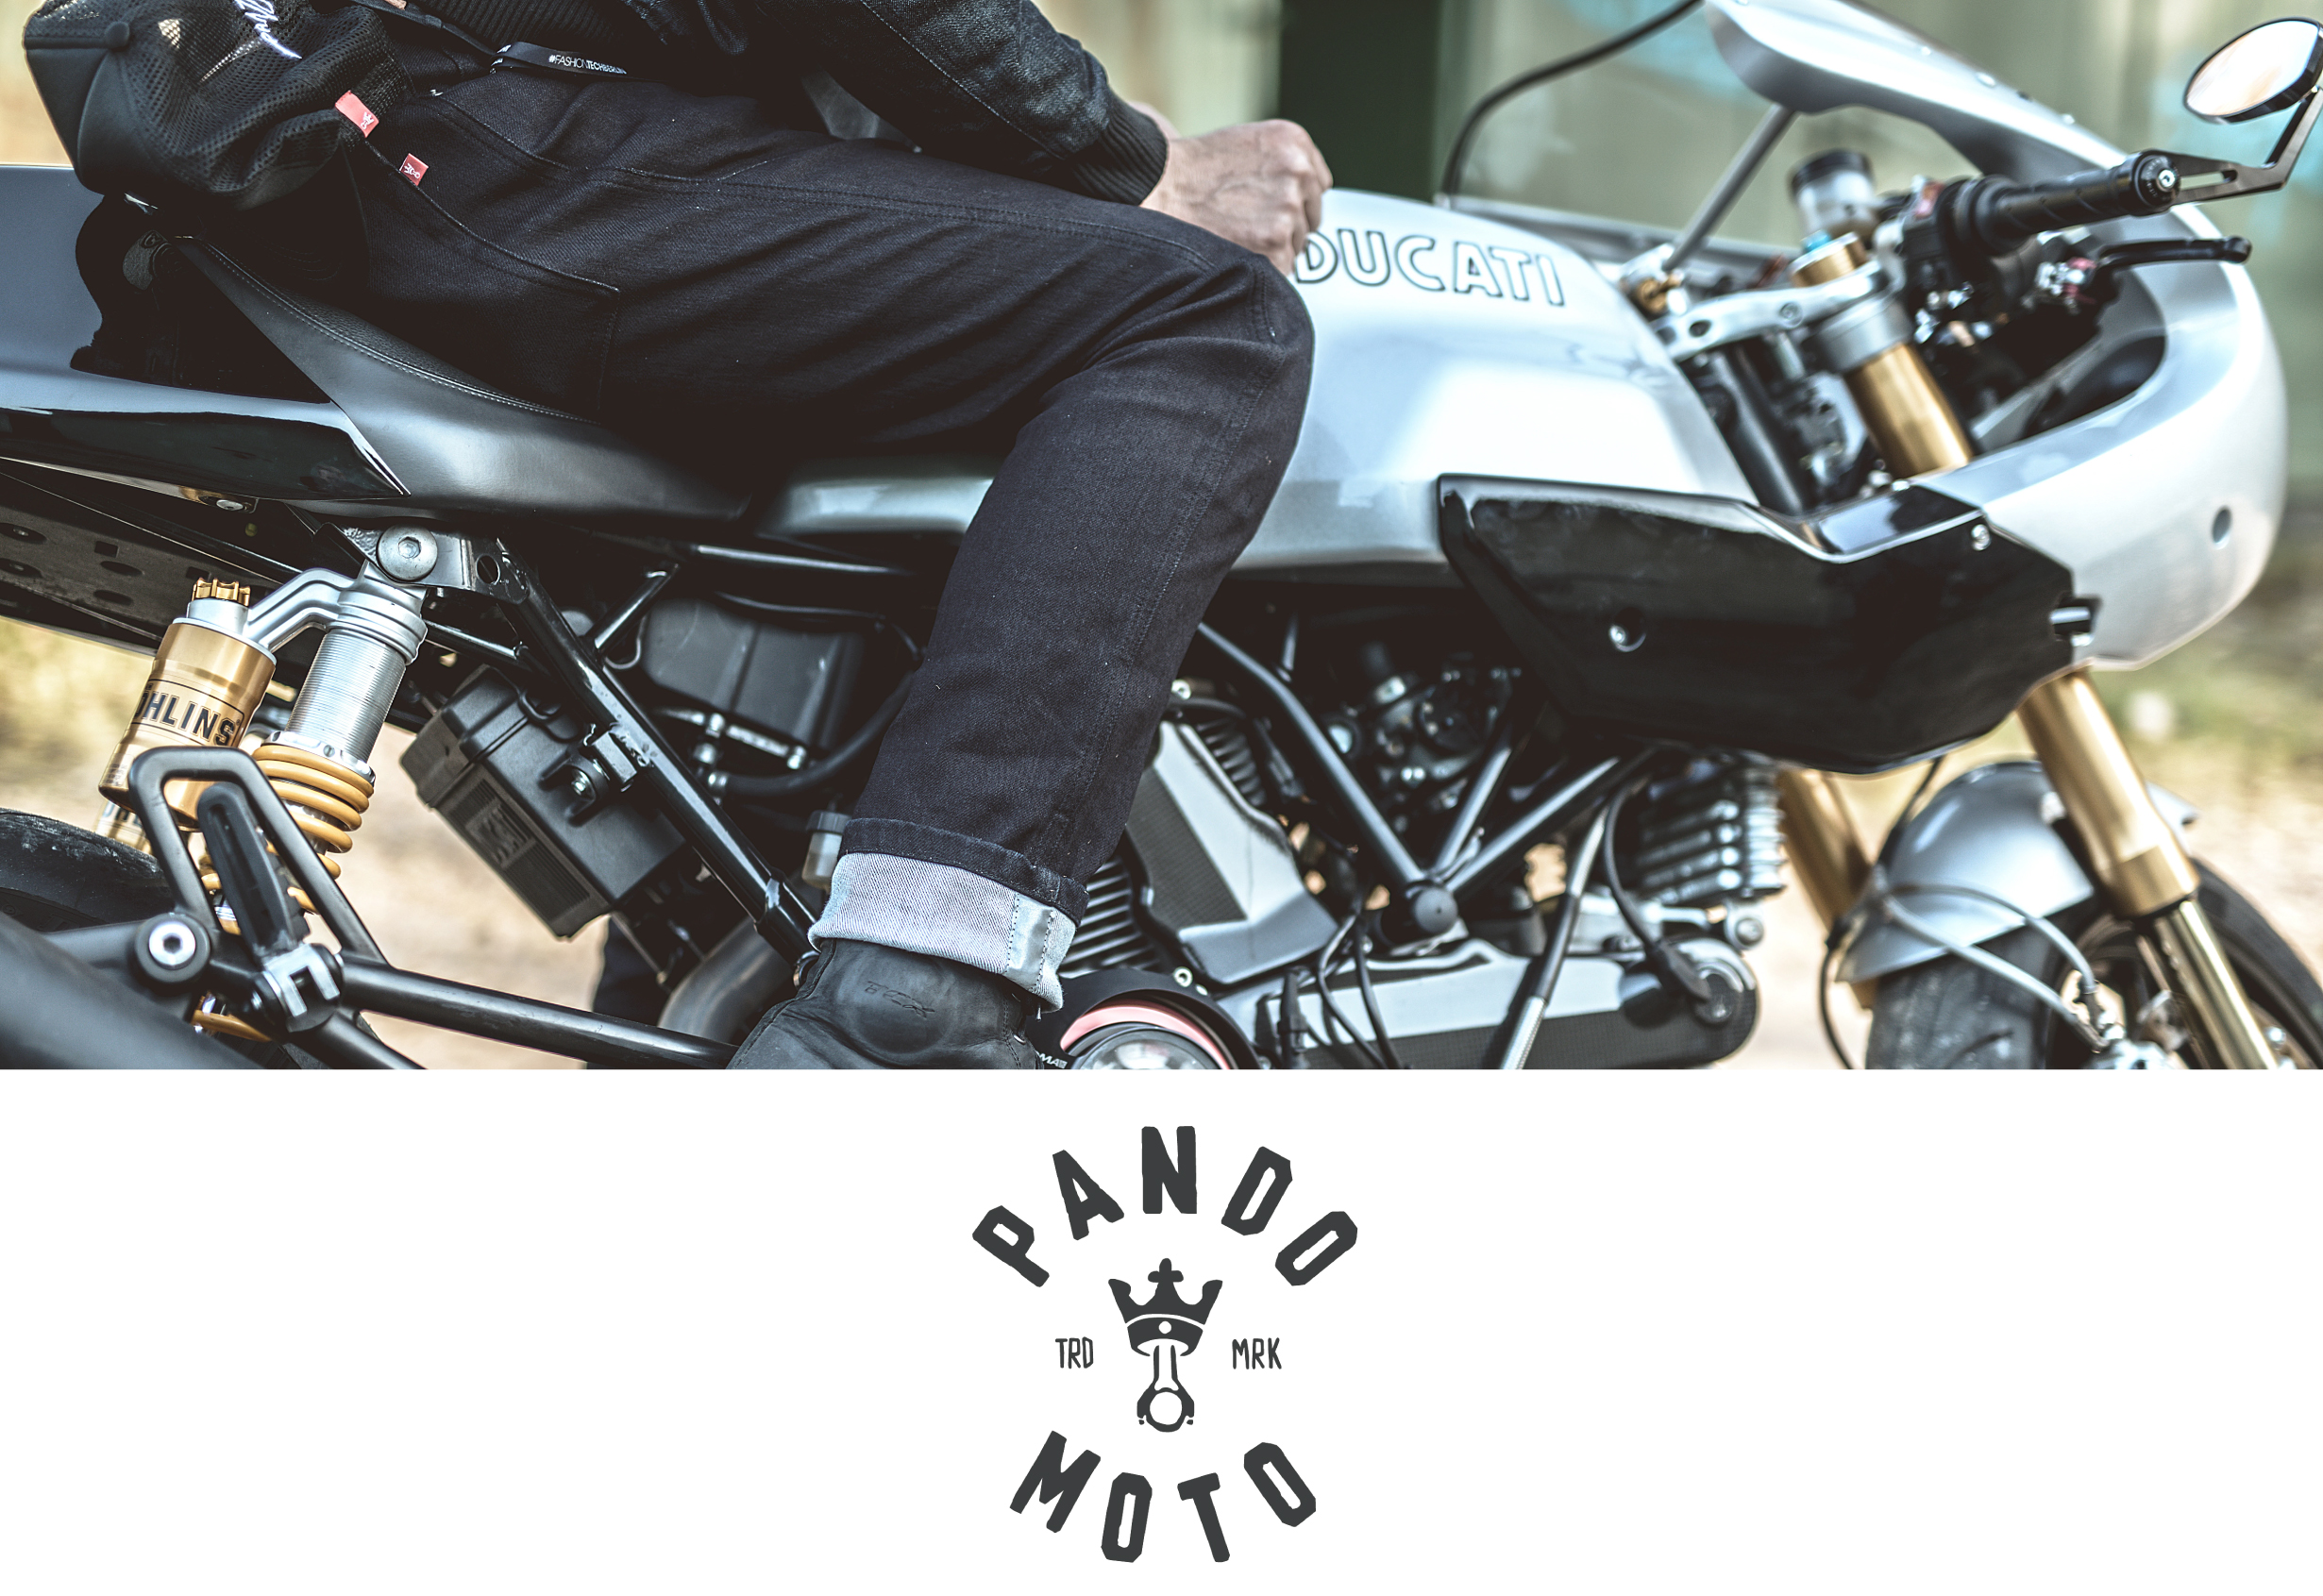 【PANDO MOTO】Motorimoda( モトーリモーダ)取扱開始のお知らせ